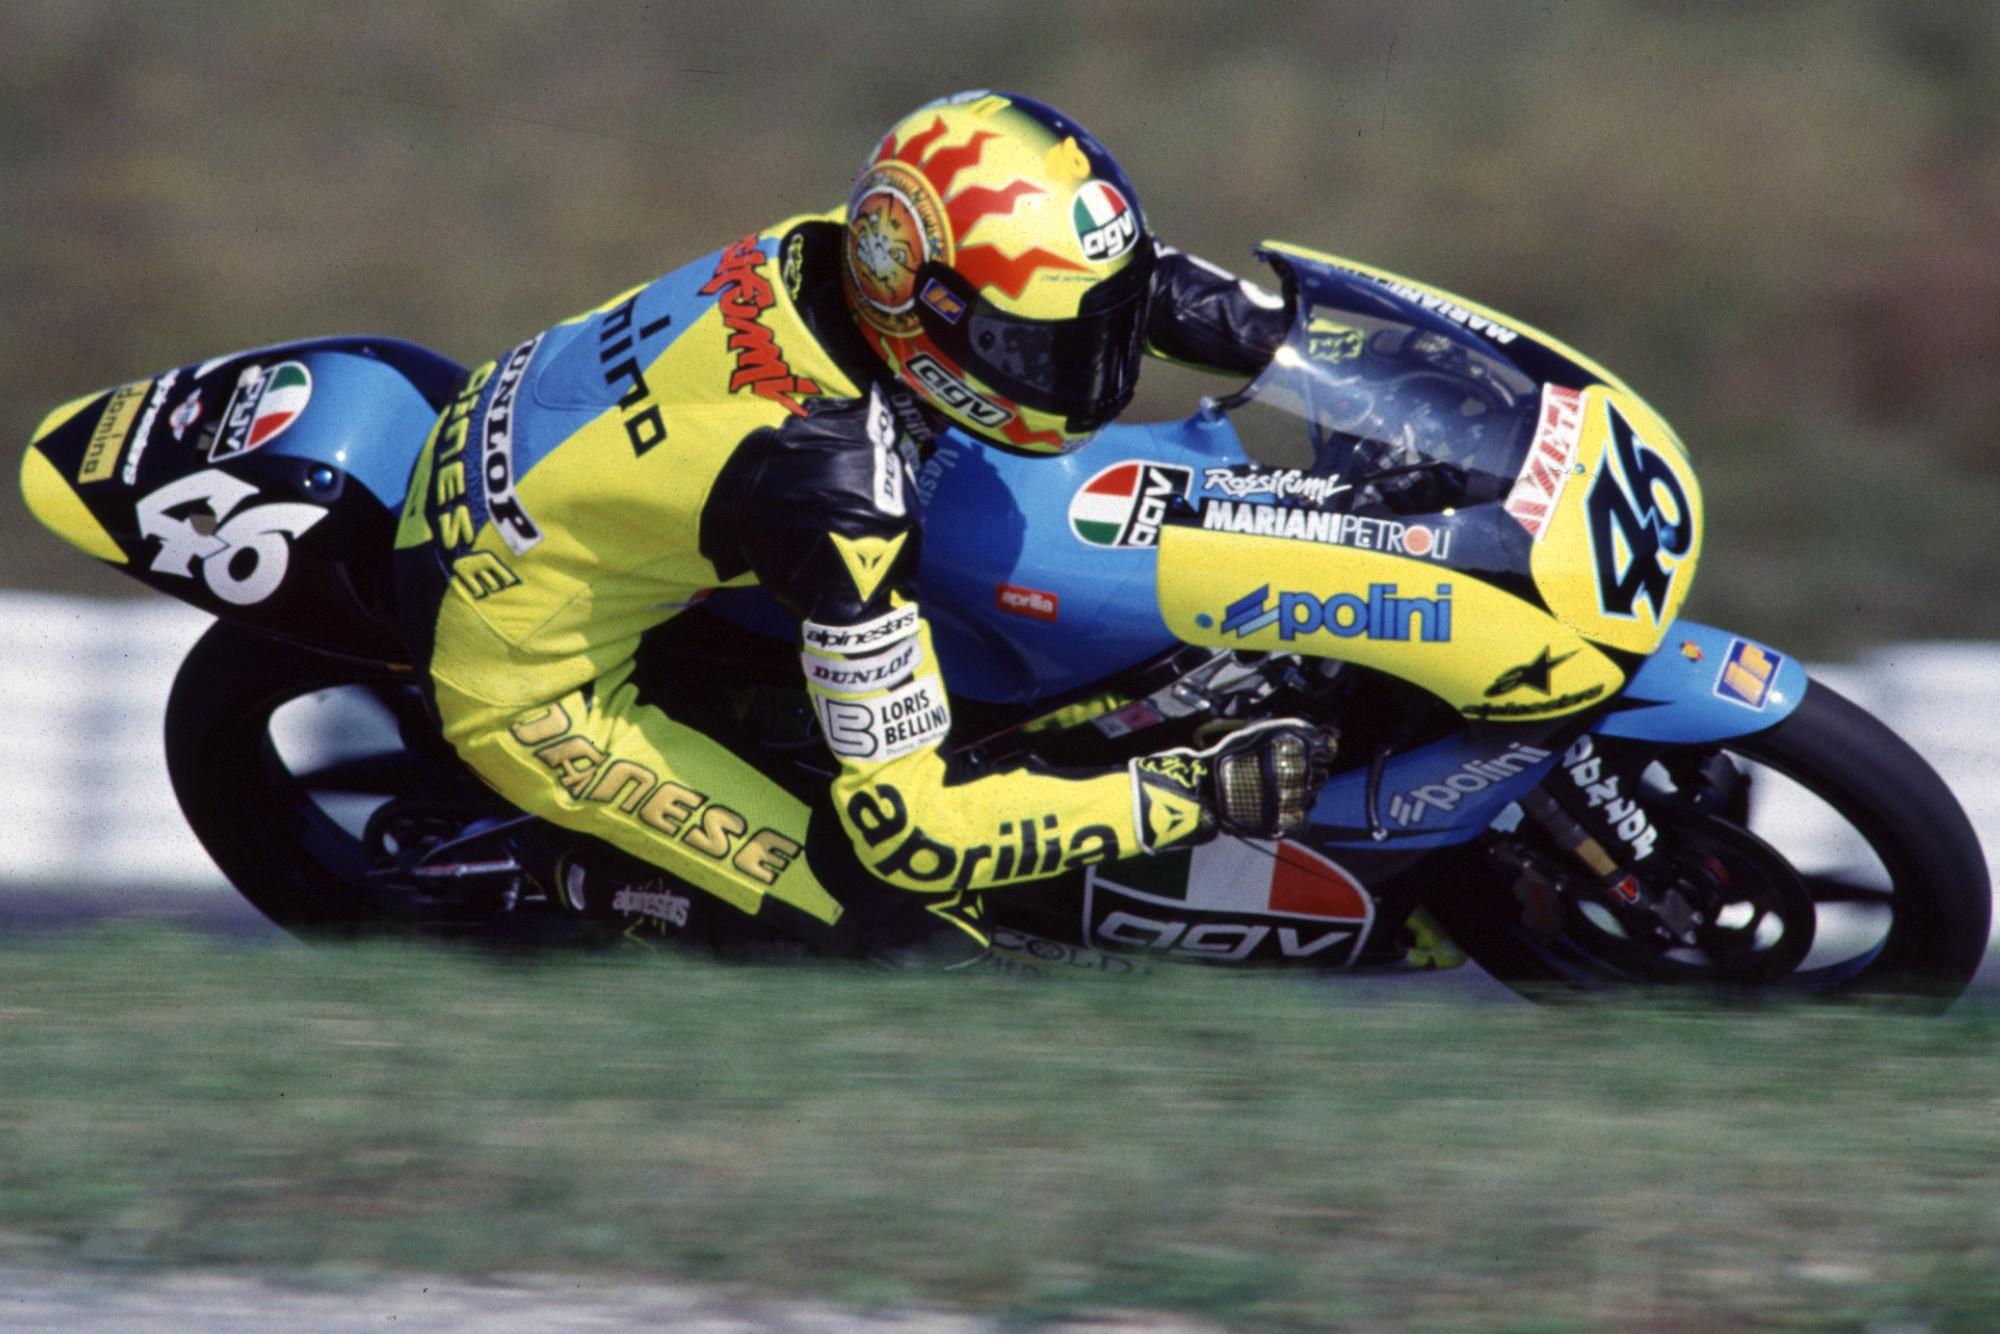 Happy 24th MotoGP birthday to Valentino Rossi!